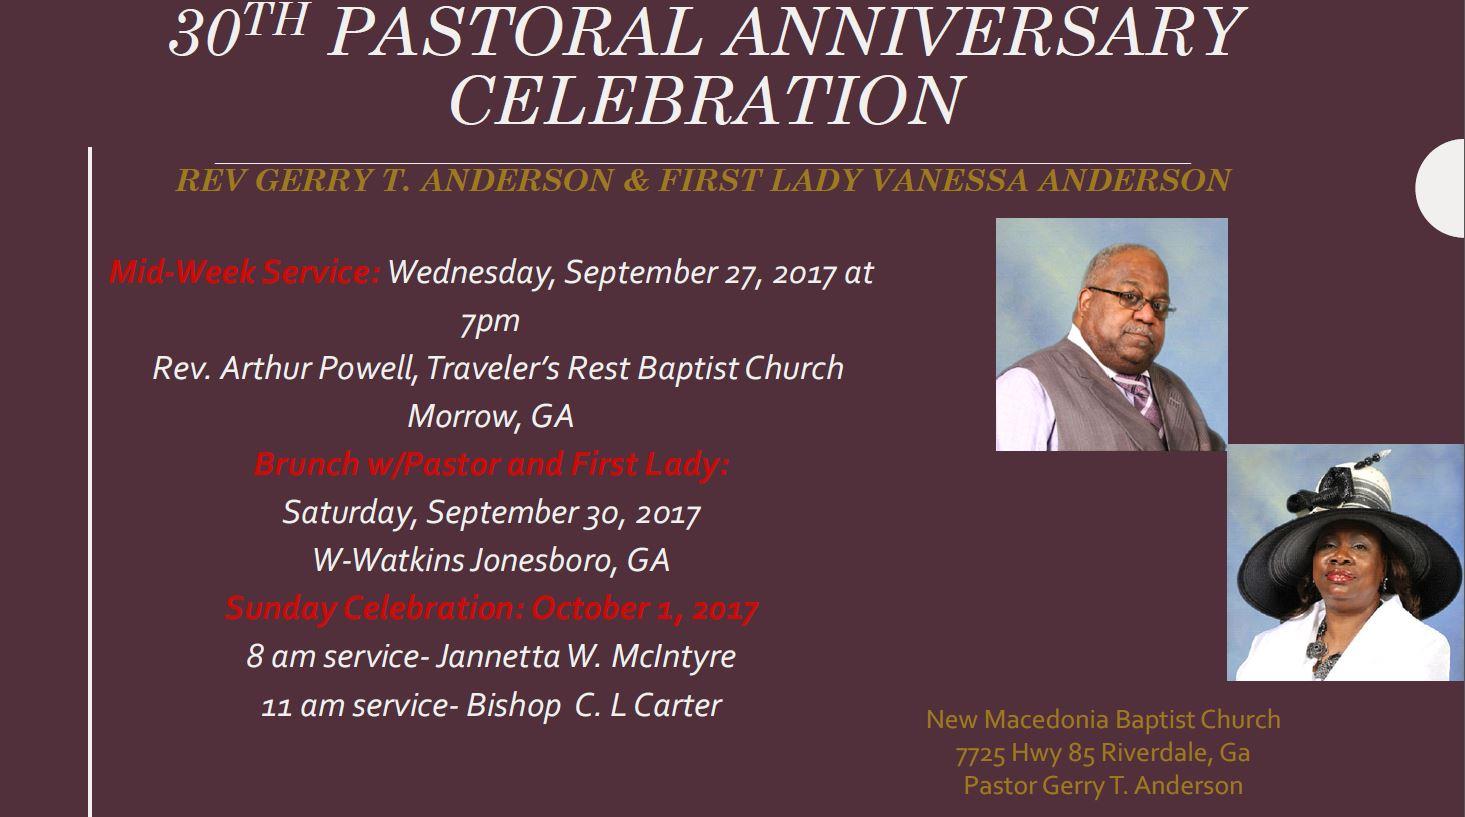 30th Pastoral Anniversary Celebration